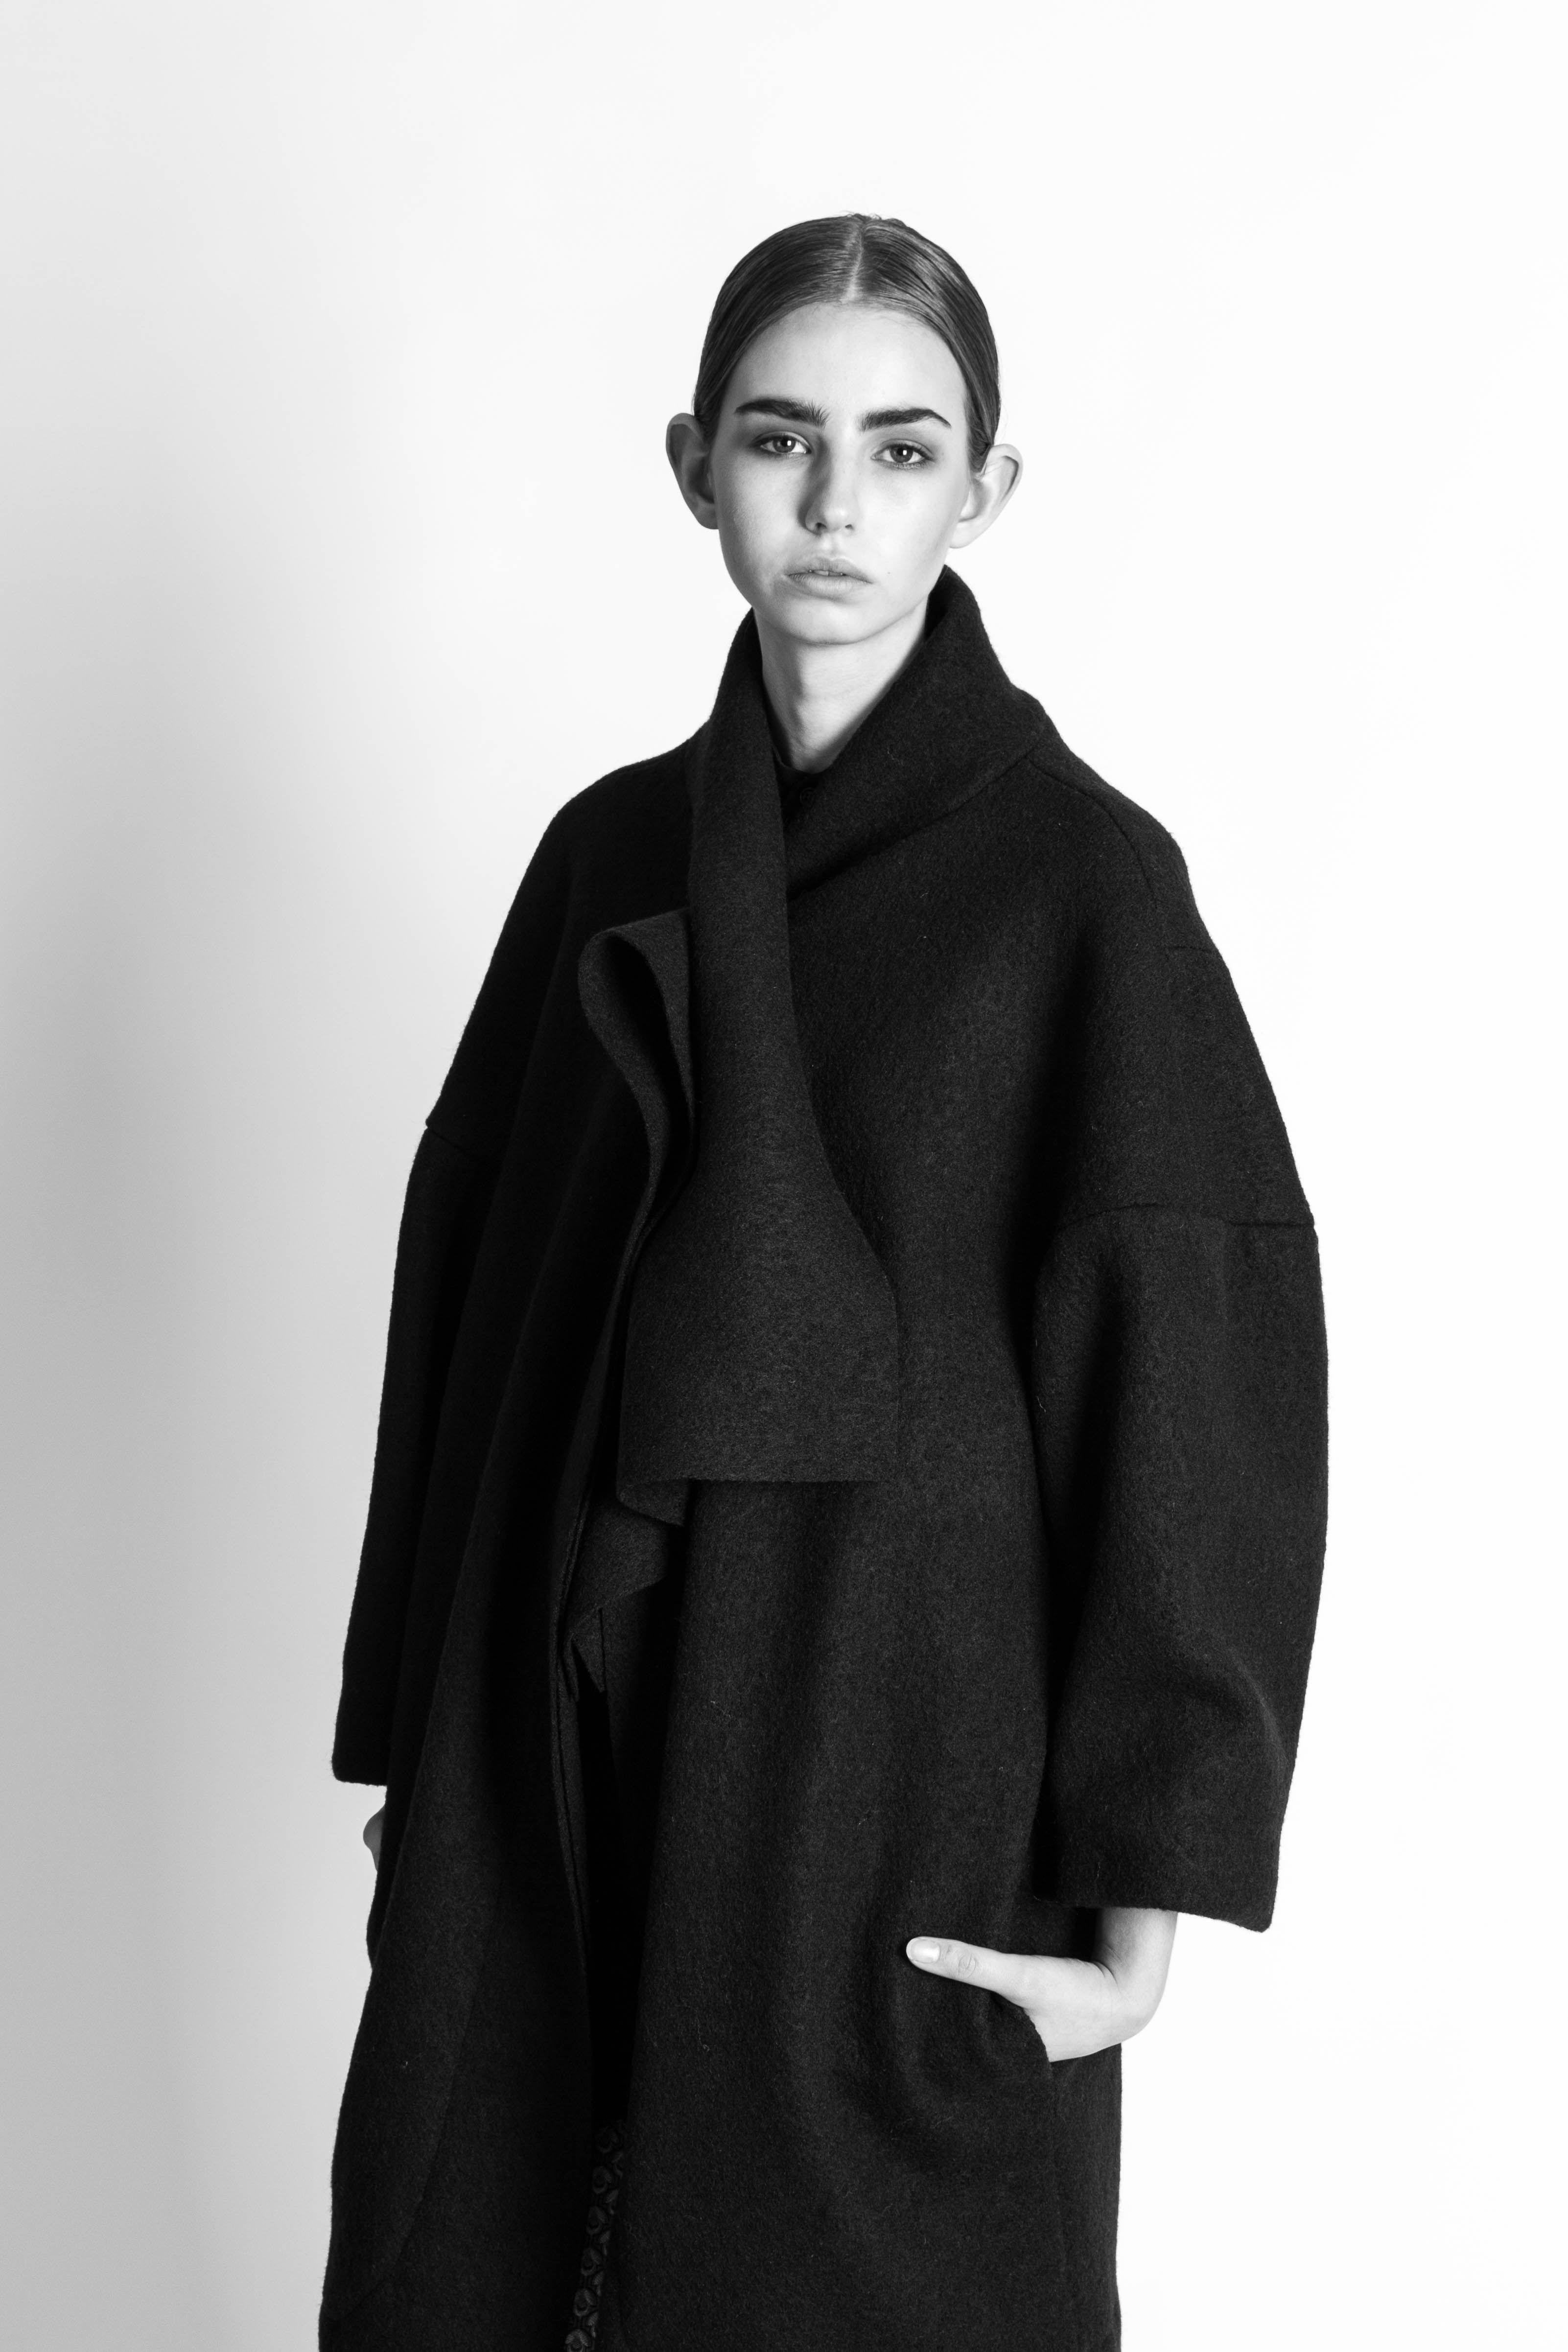 VIBE JOHANSSON AUTUMN/WINTER 2016 #vibejohansson #aw16 #autumnwinter #paris #copenhagen #pfw #parisfashionweek #followthe buyers #nordicstyle #avantgarde #fashion #blackallblack #blackandwhite #black #photography #jacobtopmøller  Photo: Jacob Top Møller